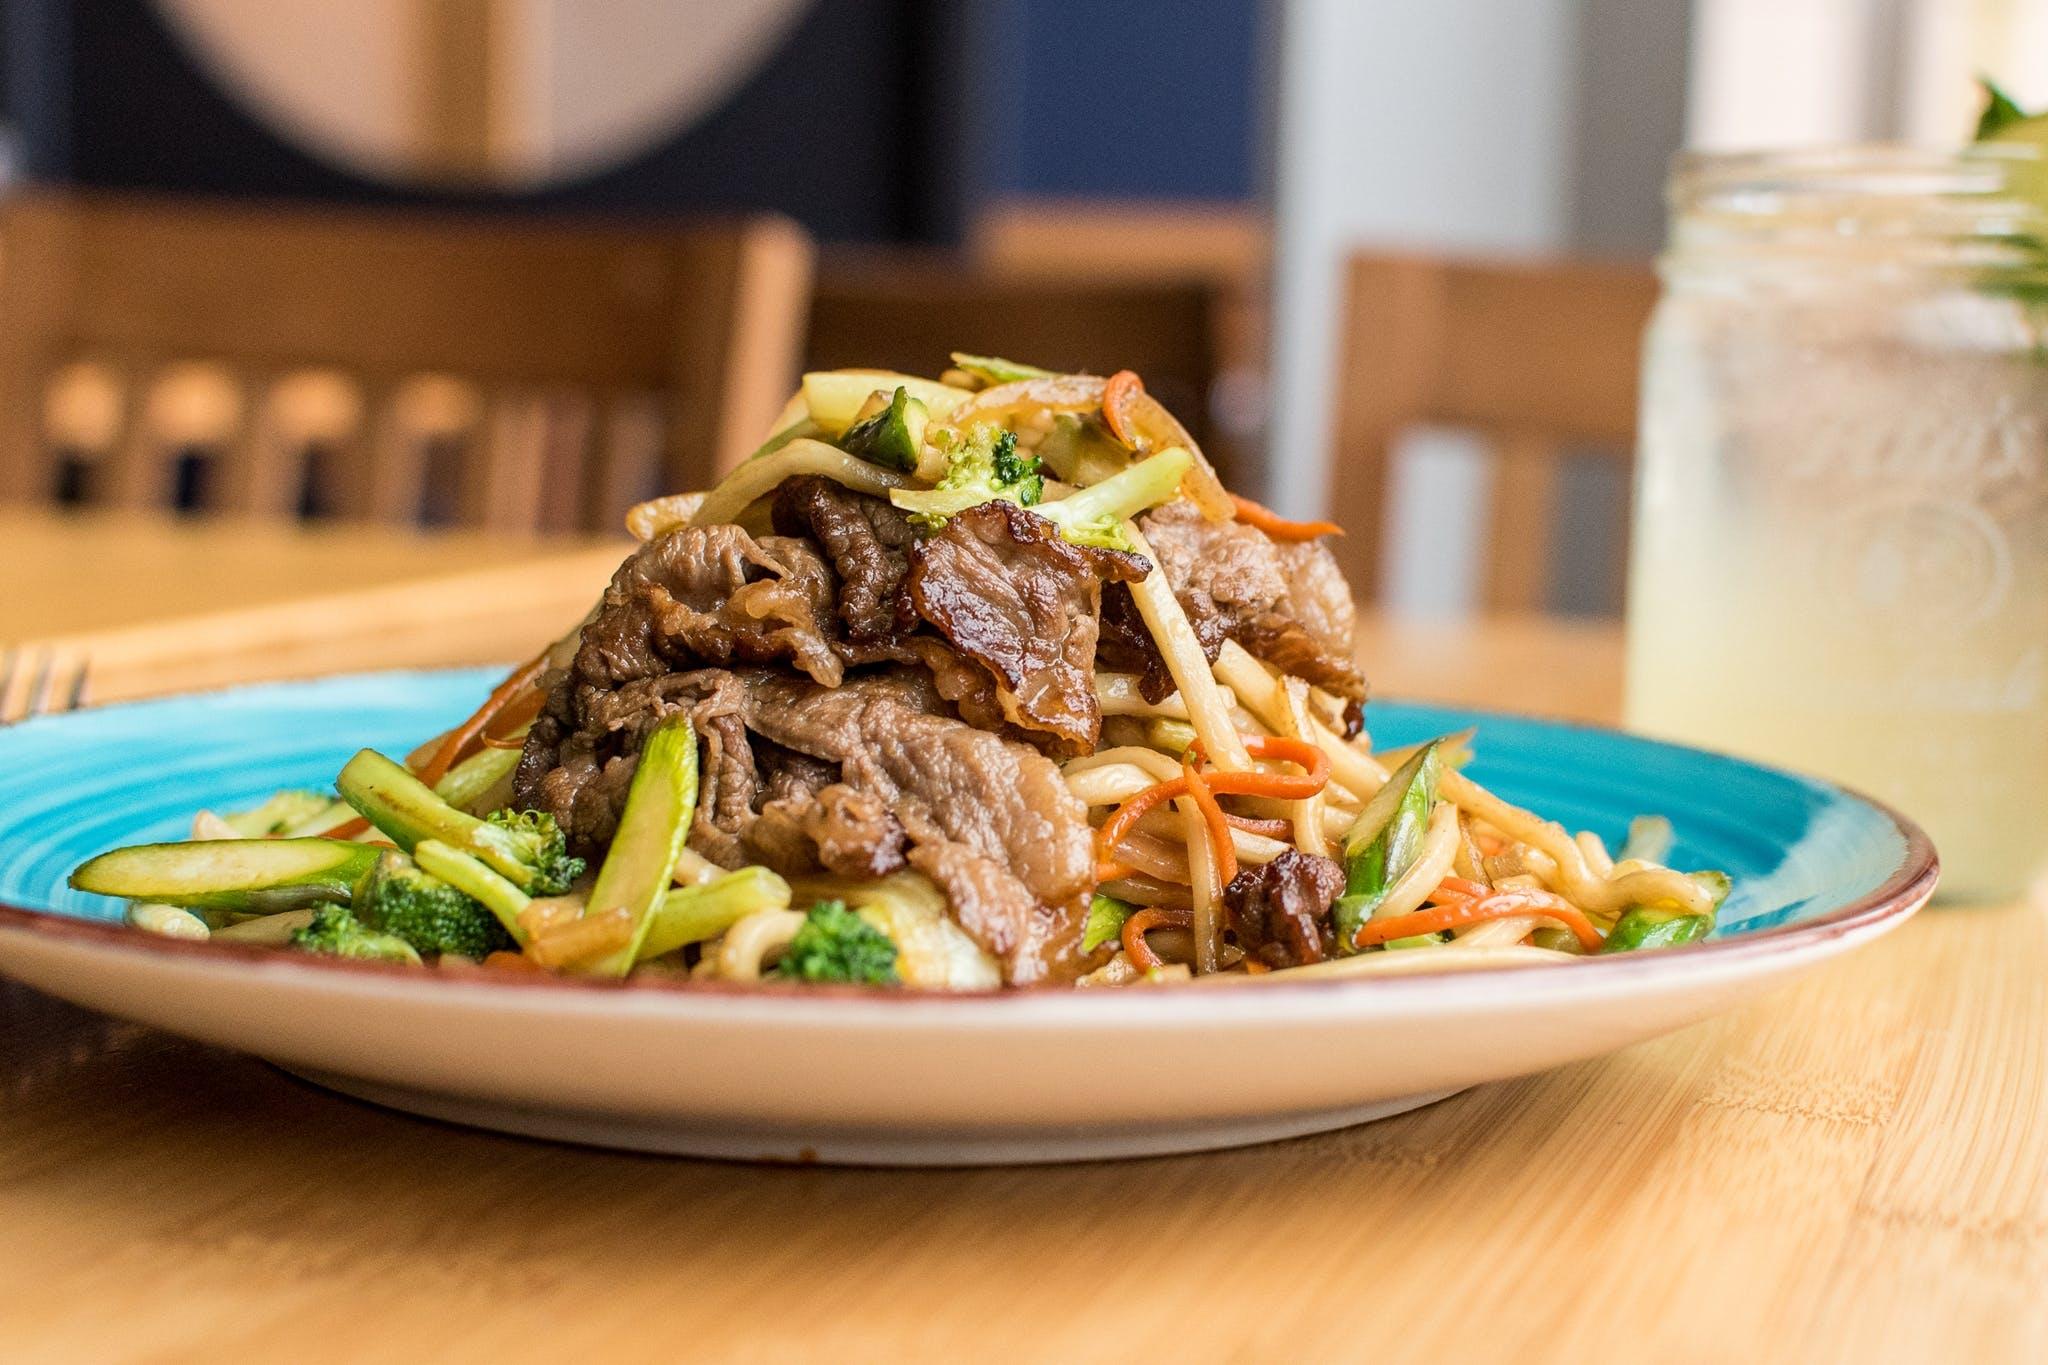 Sauteed Steak Udon from Tavernakaya in Madison, WI